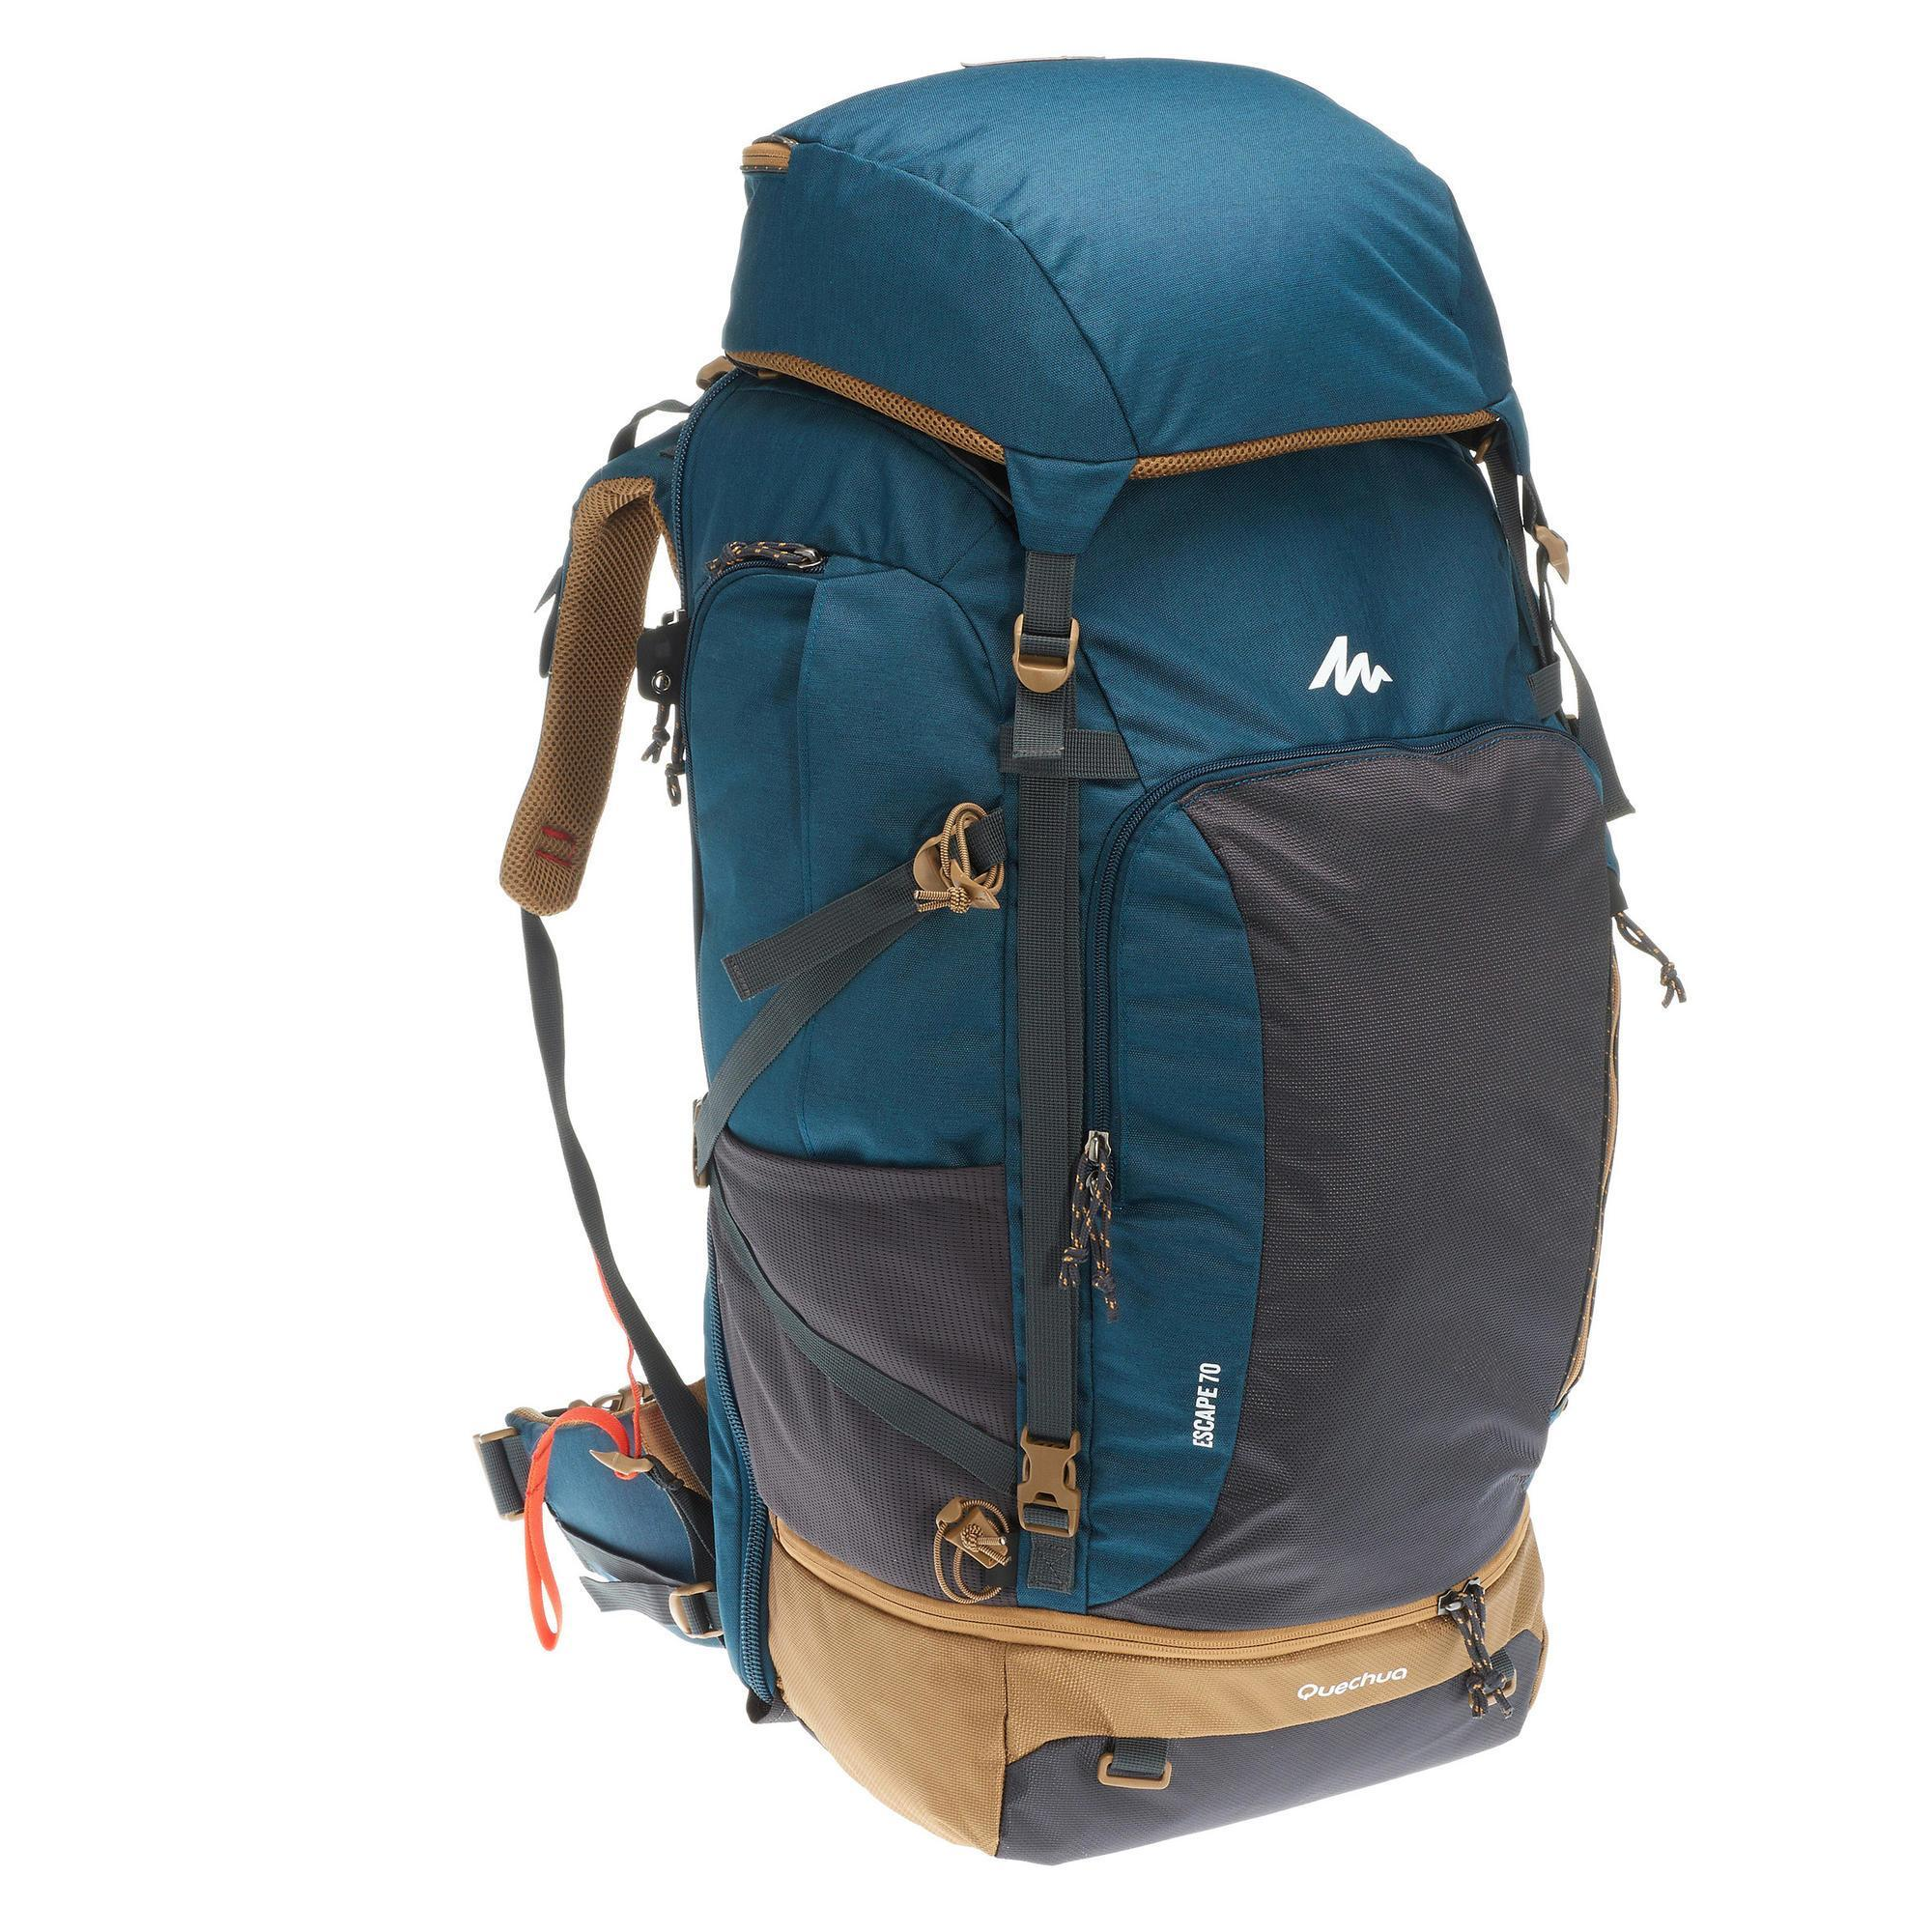 2e69c75c6 Mochila de Montaña y Trekking Forclaz Travel500 70 Litros Hombre Azul  Forclaz